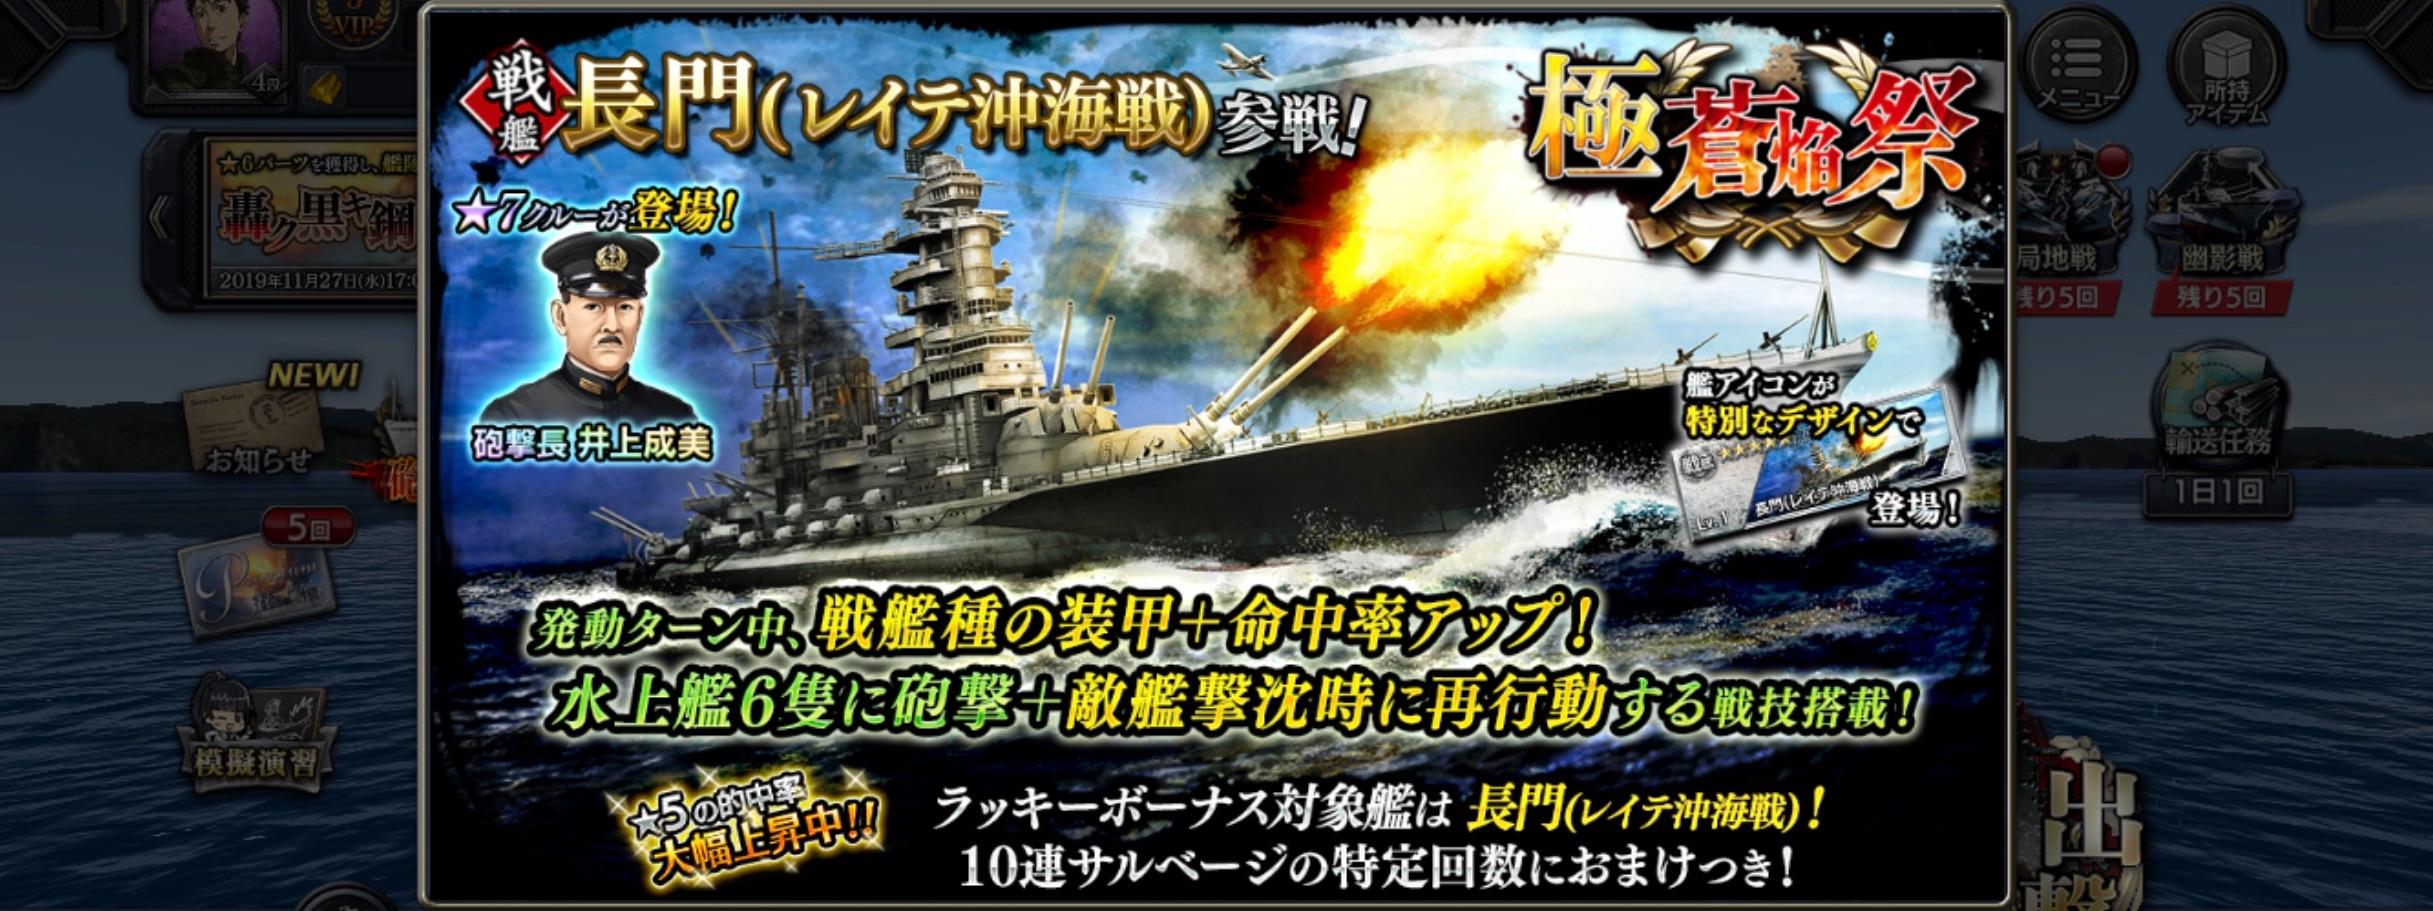 battleship-nagato